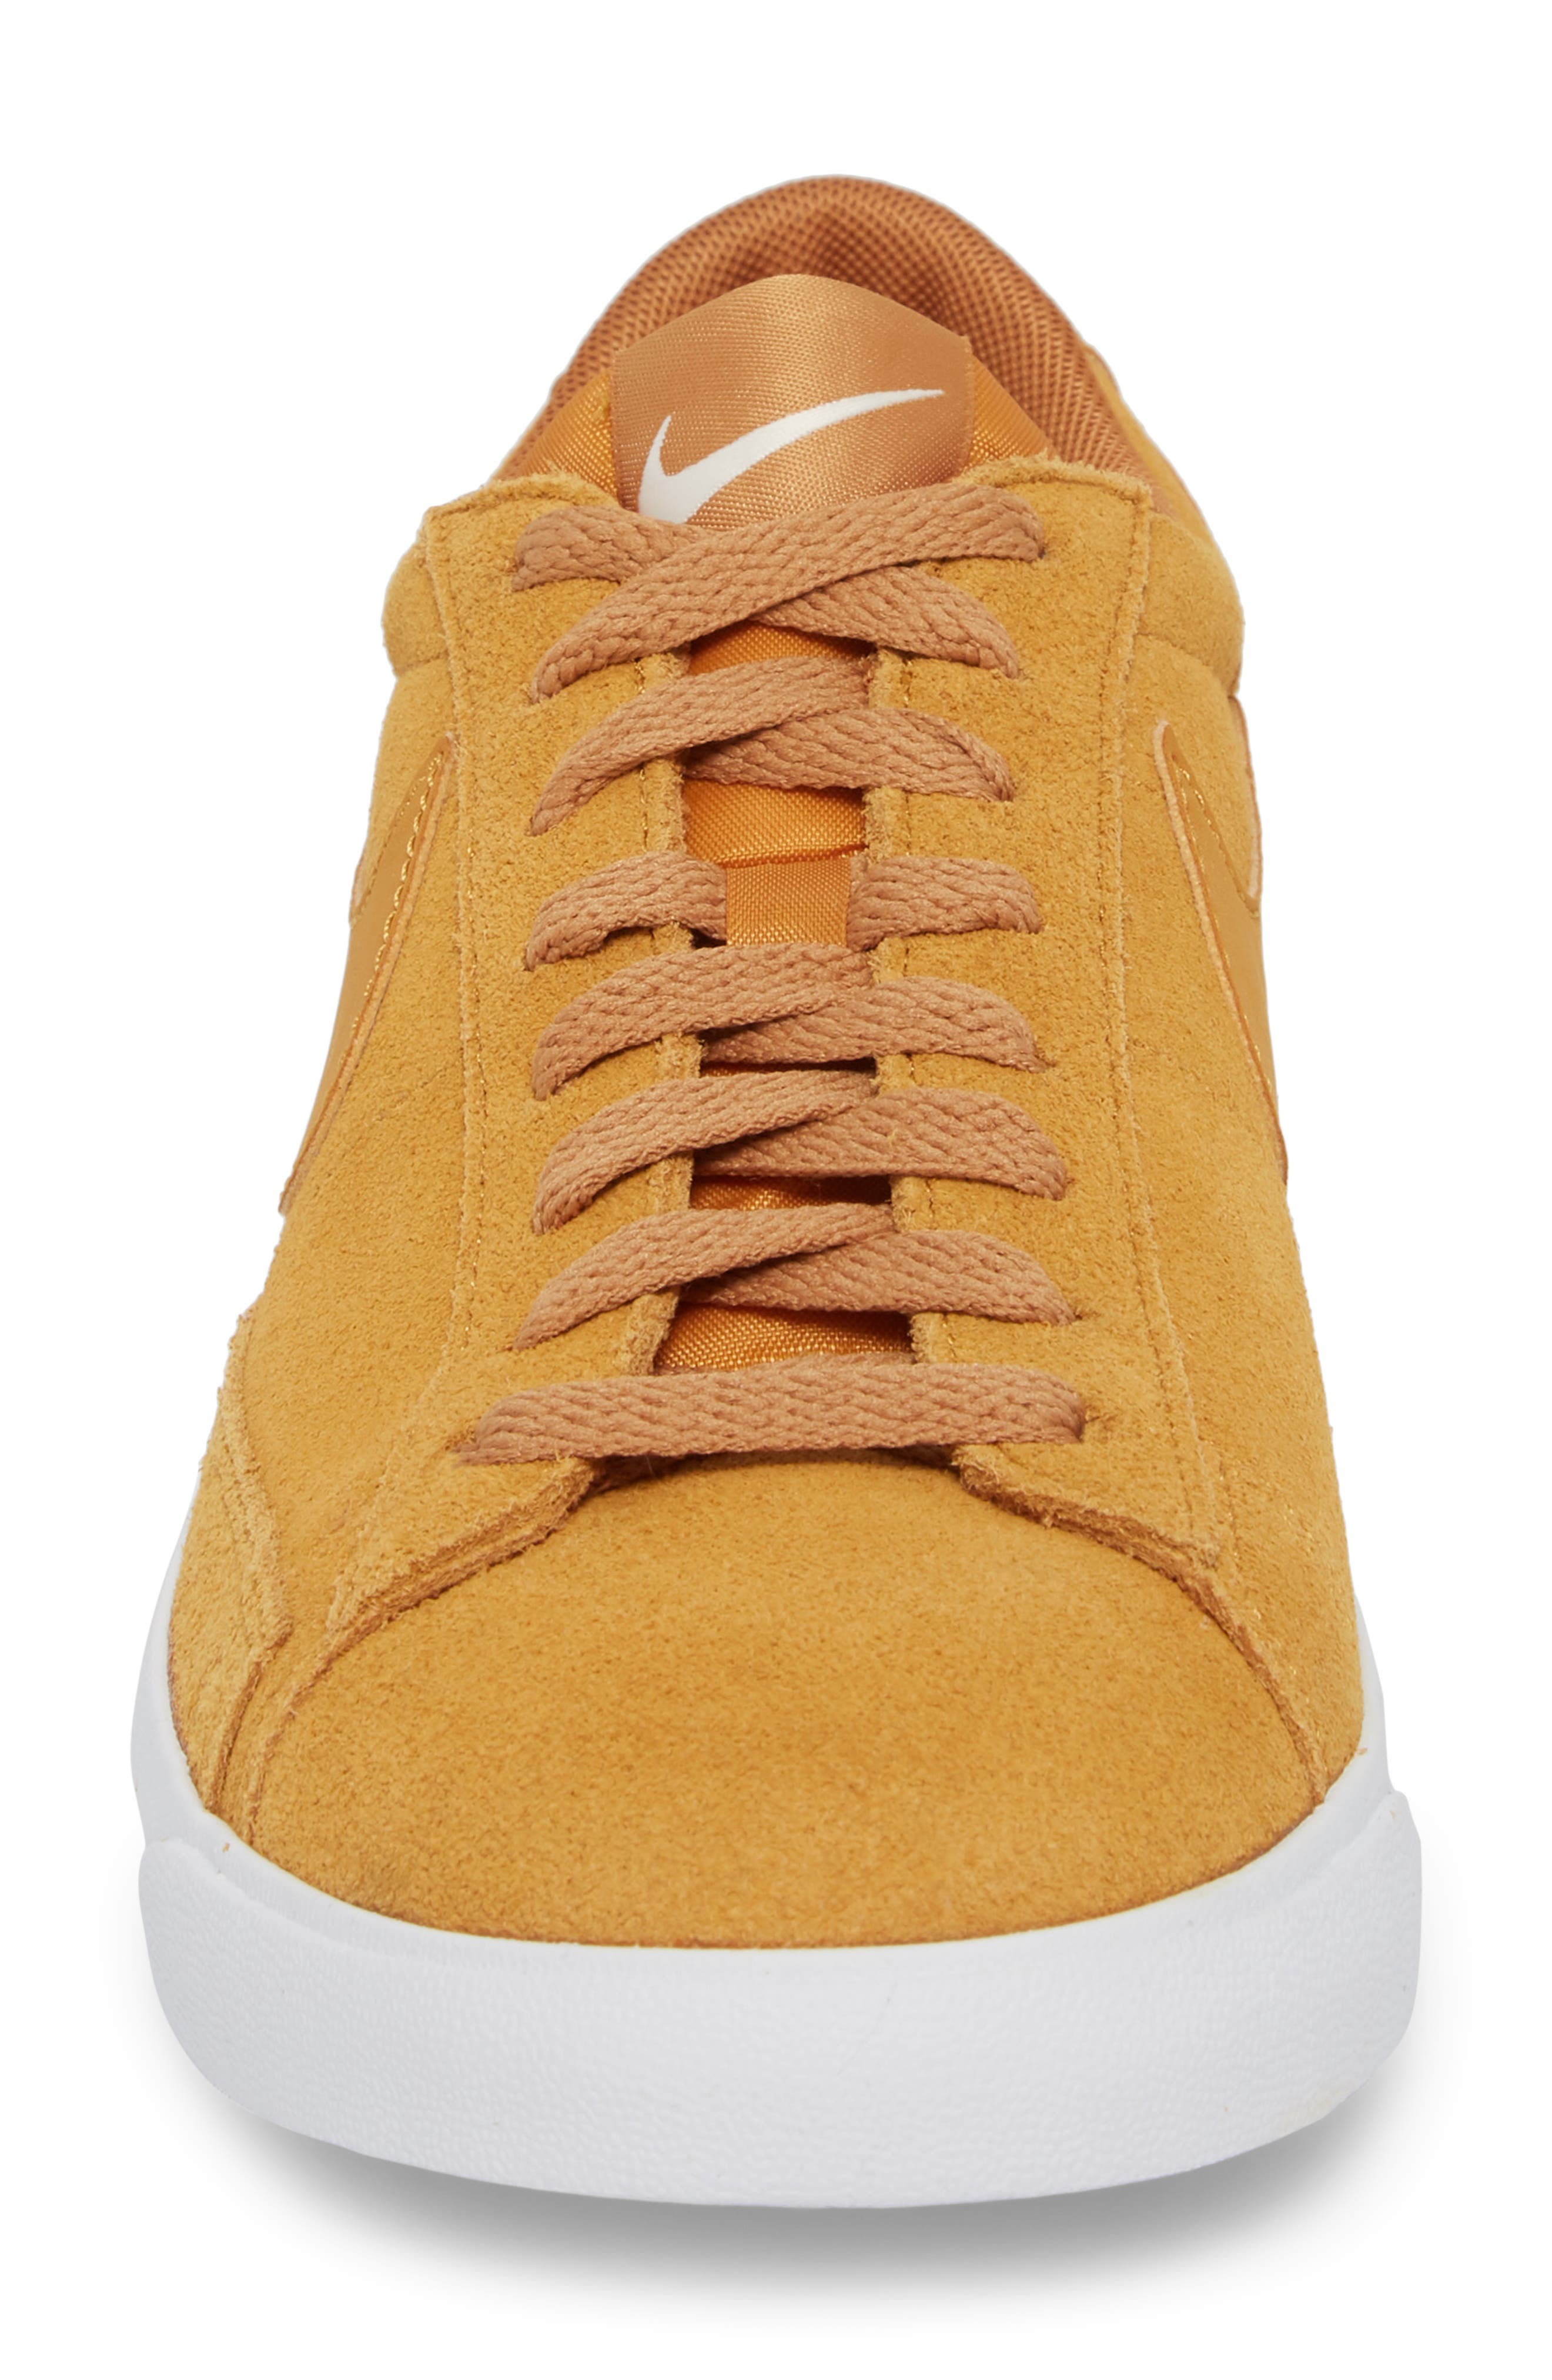 Blazer Low Suede Sneaker,                             Alternate thumbnail 4, color,                             260